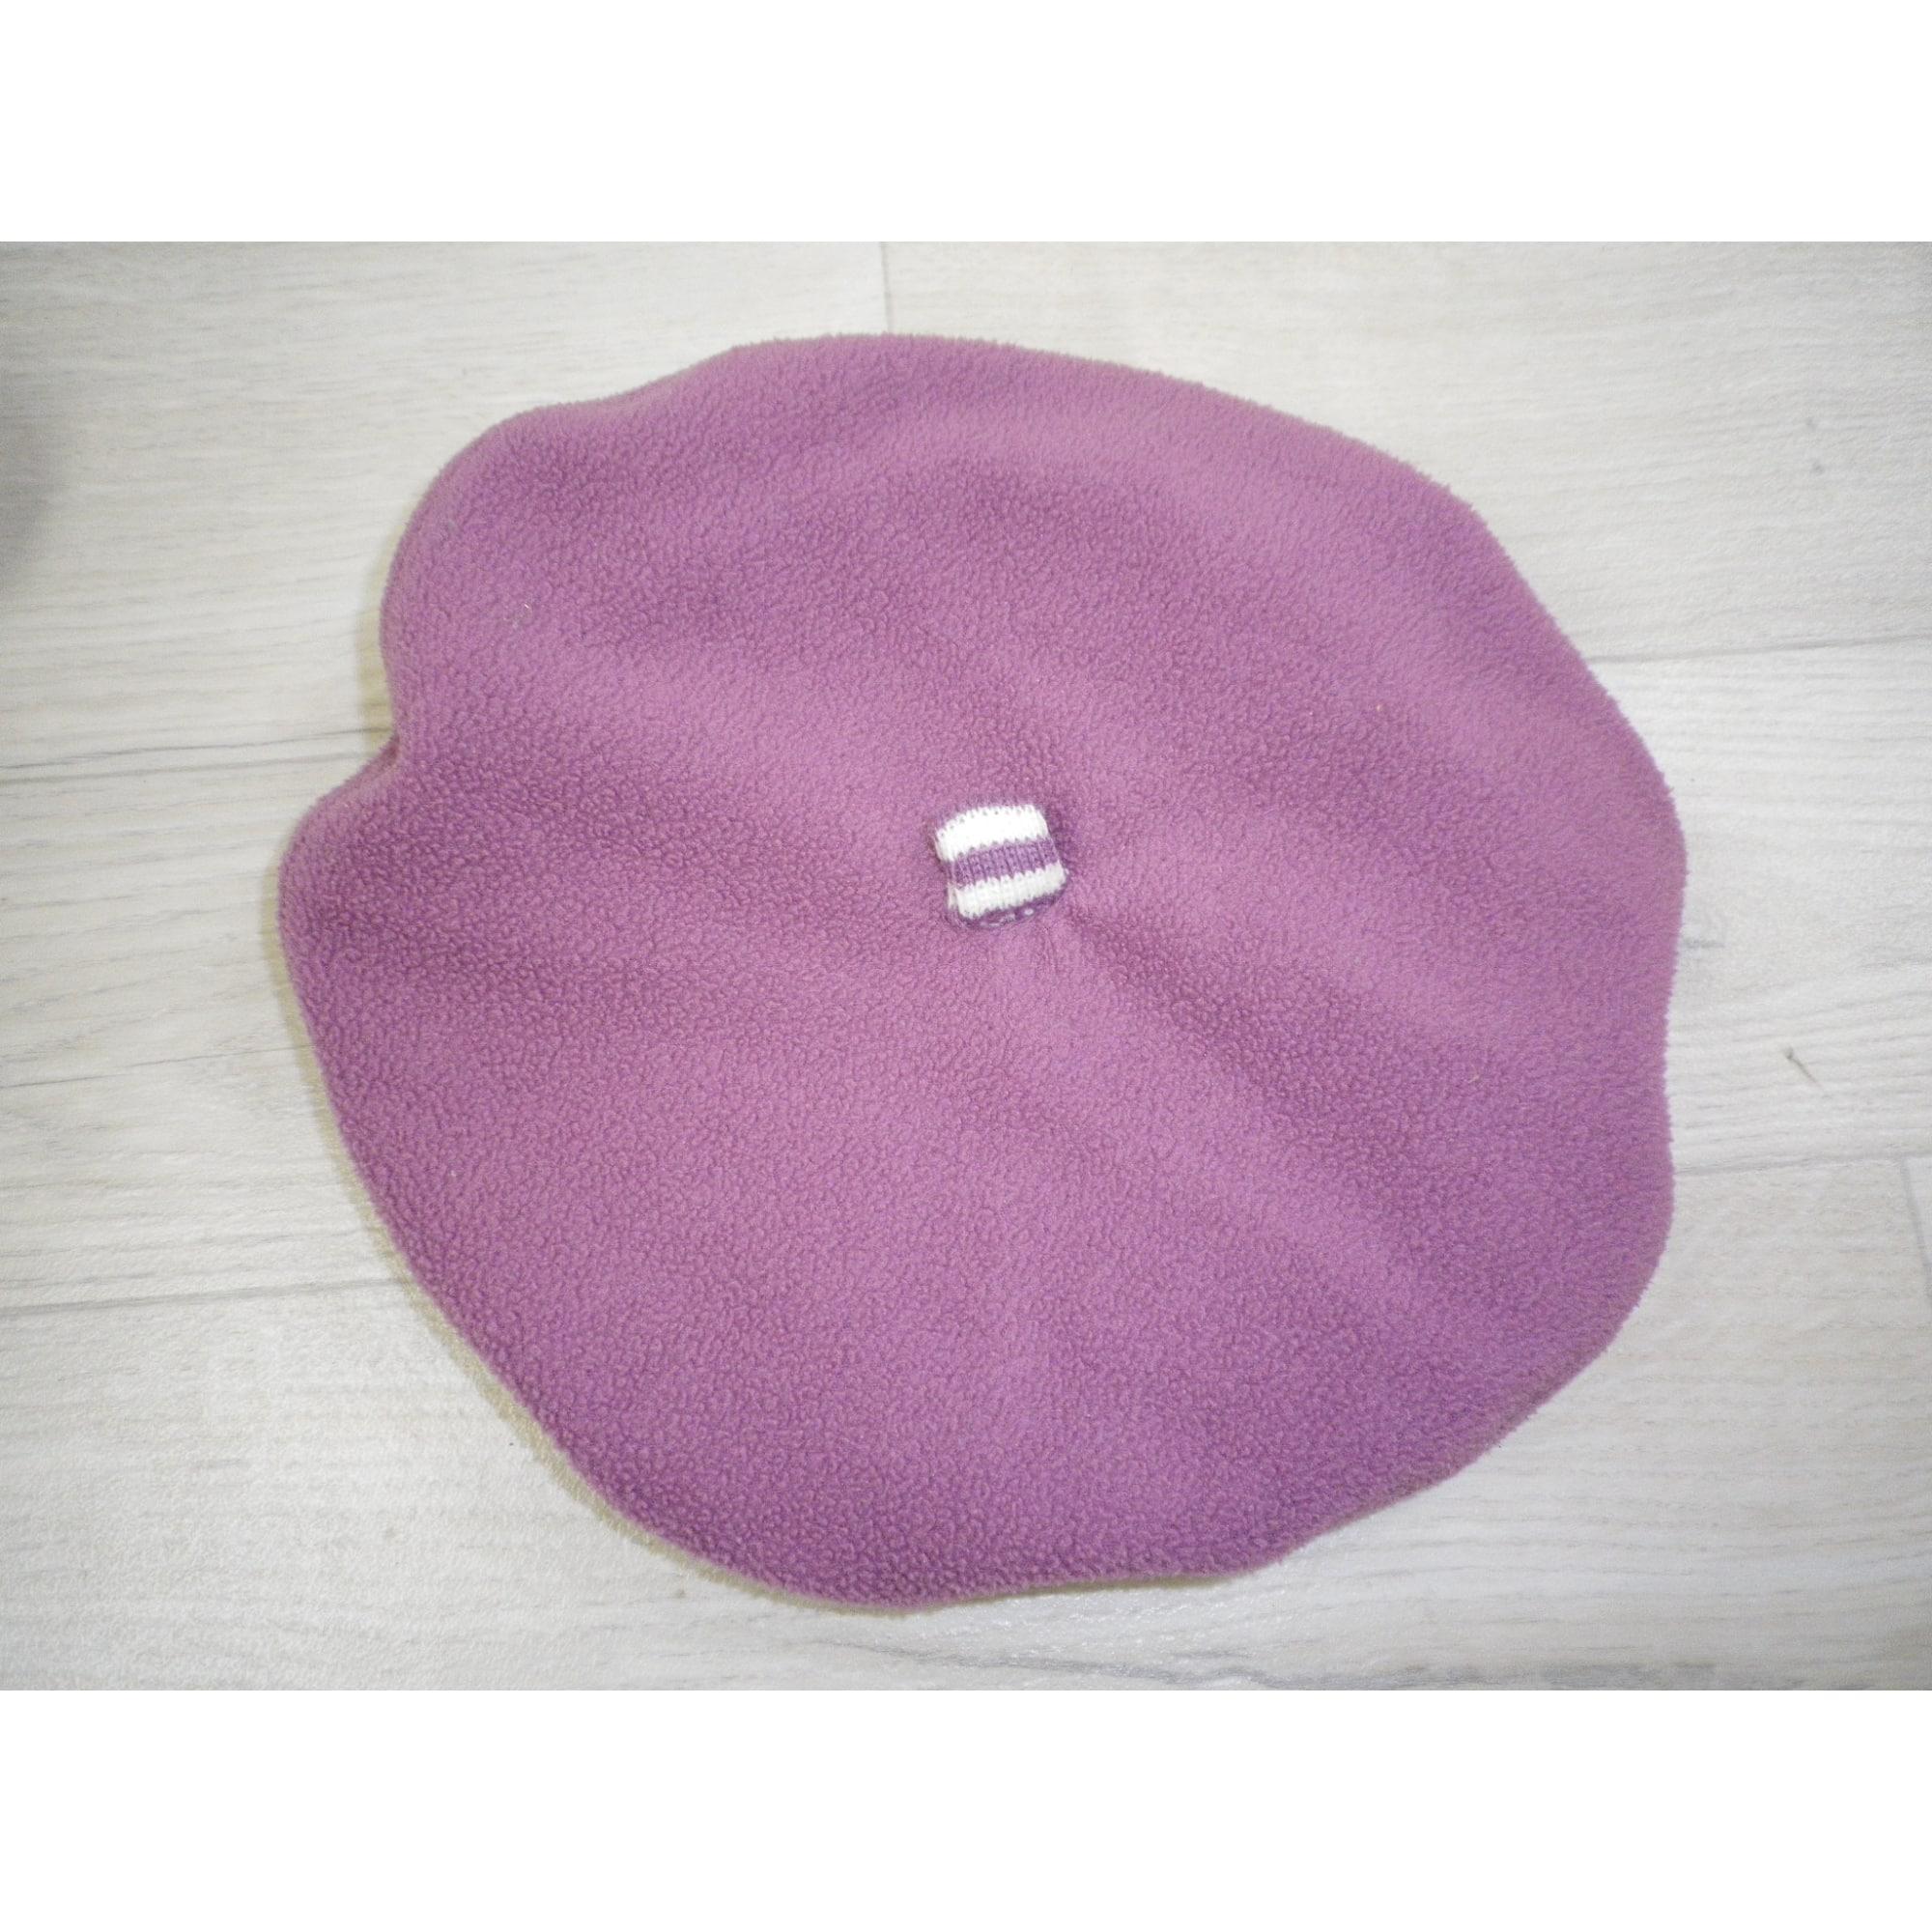 Bonnet OKAÏDI 3-4 ans violet - 804199 a42e30186fa